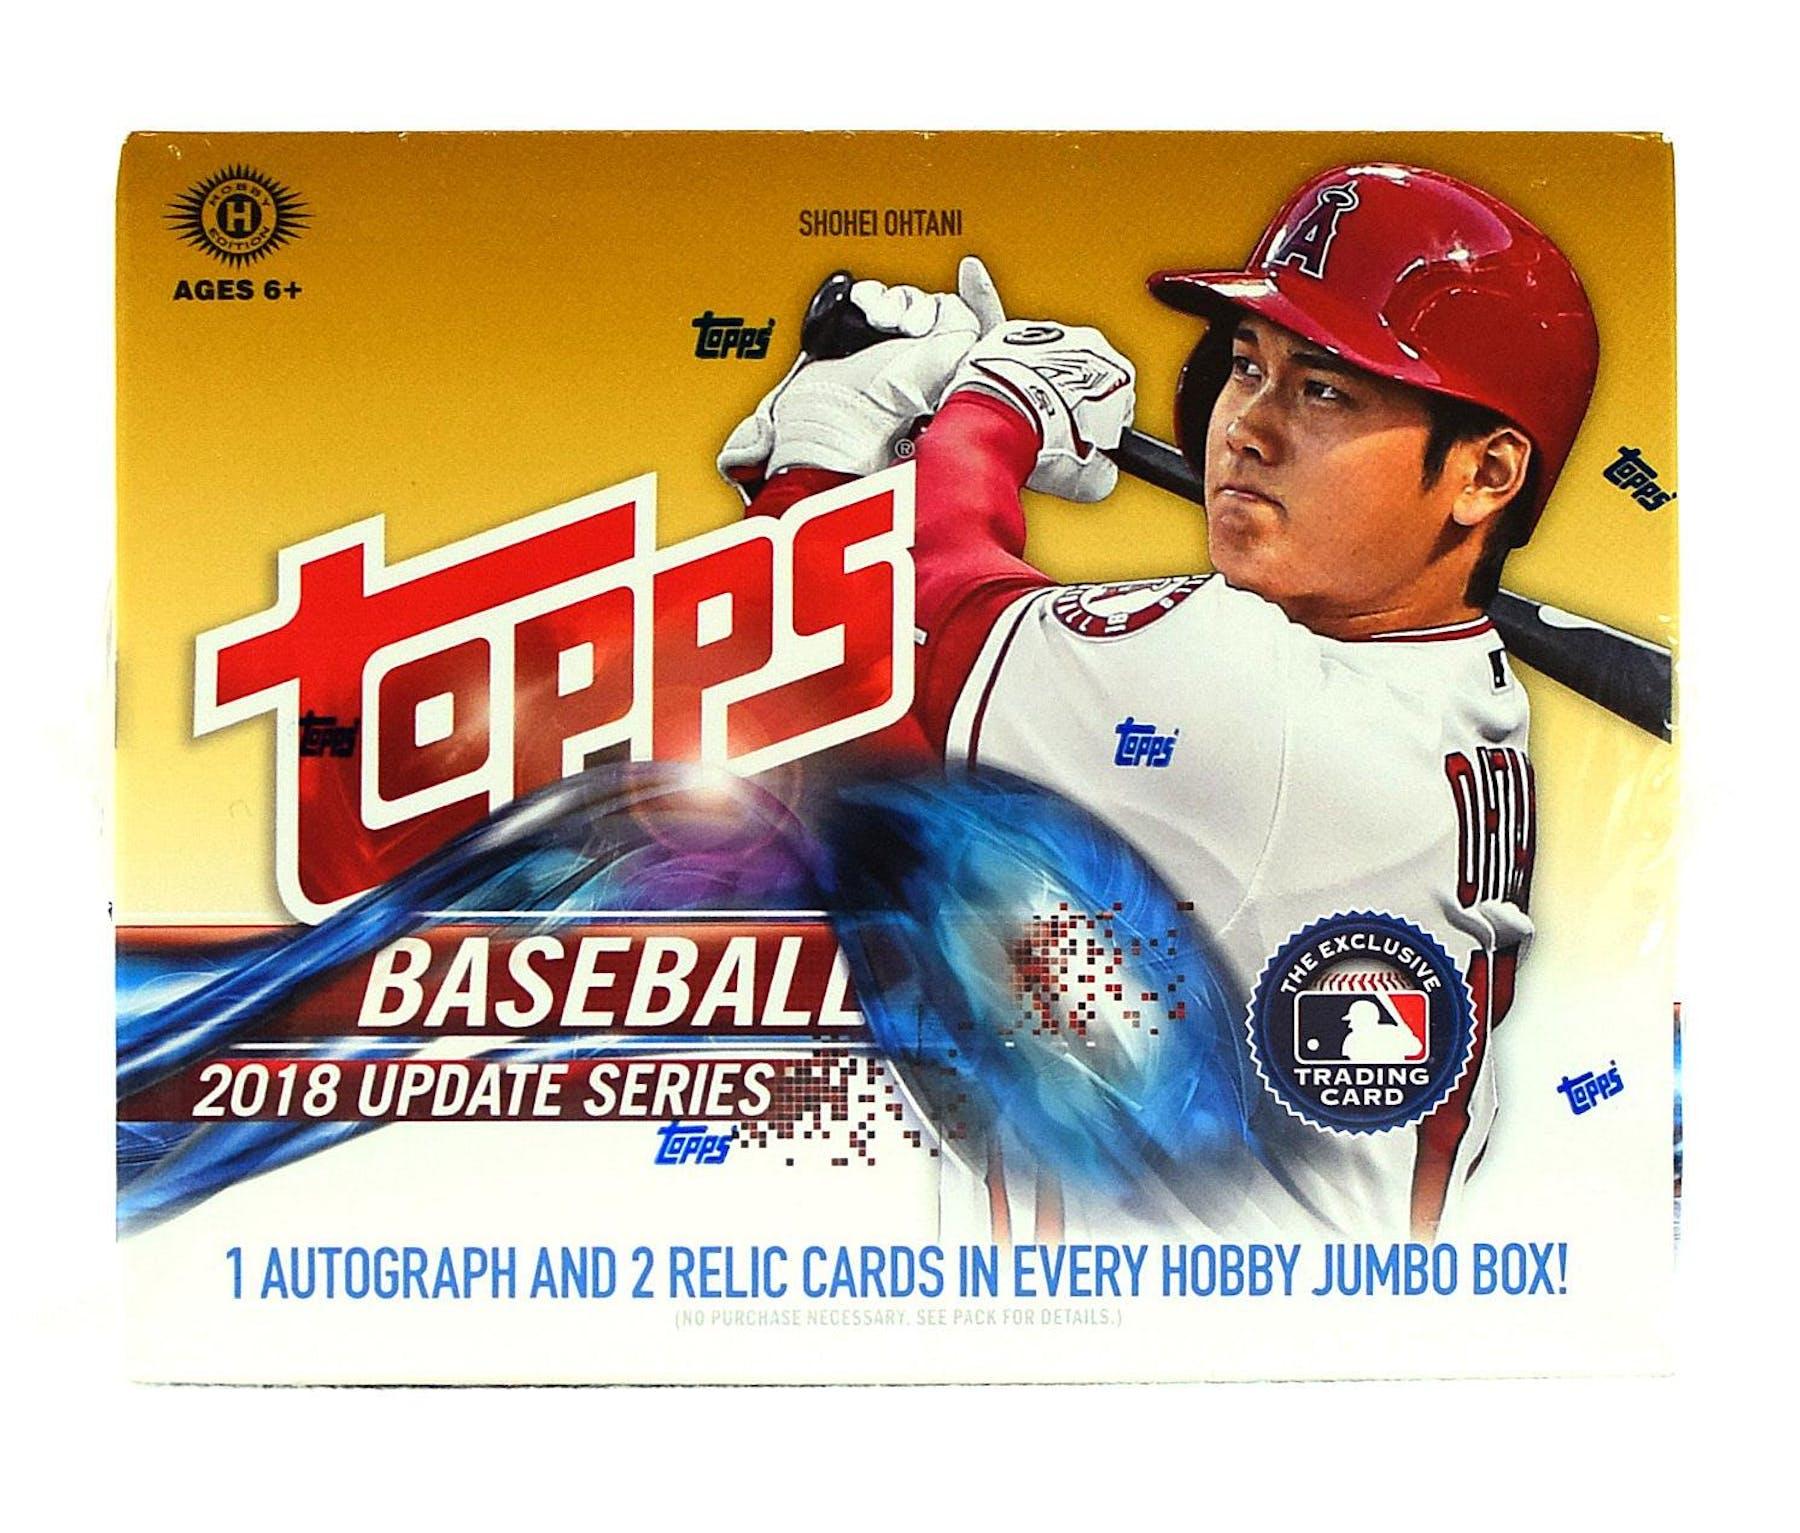 2018 Topps Update Series Baseball Hobby Jumbo Box Da Card World